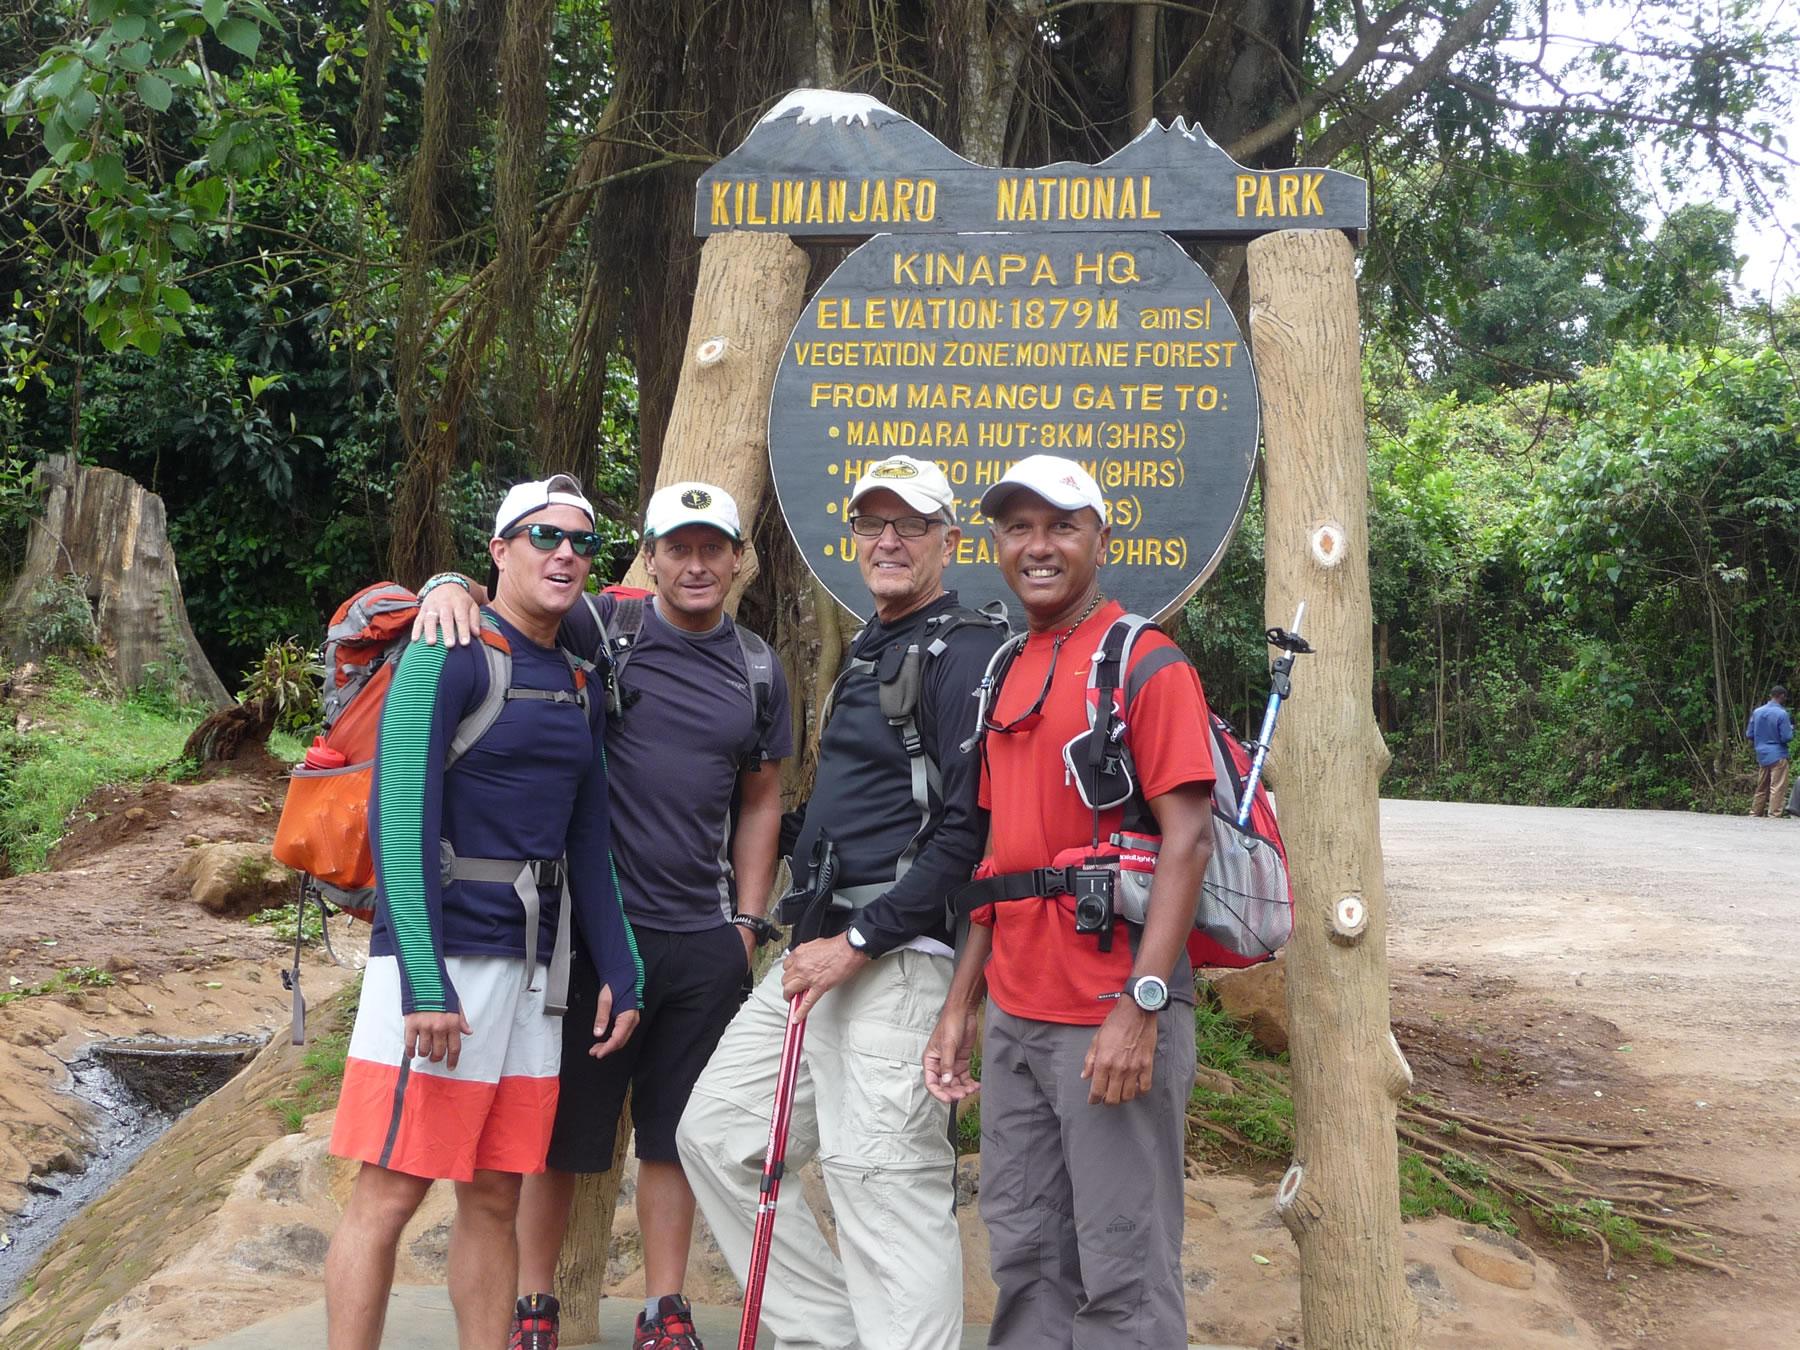 New Kilimanjaro Record